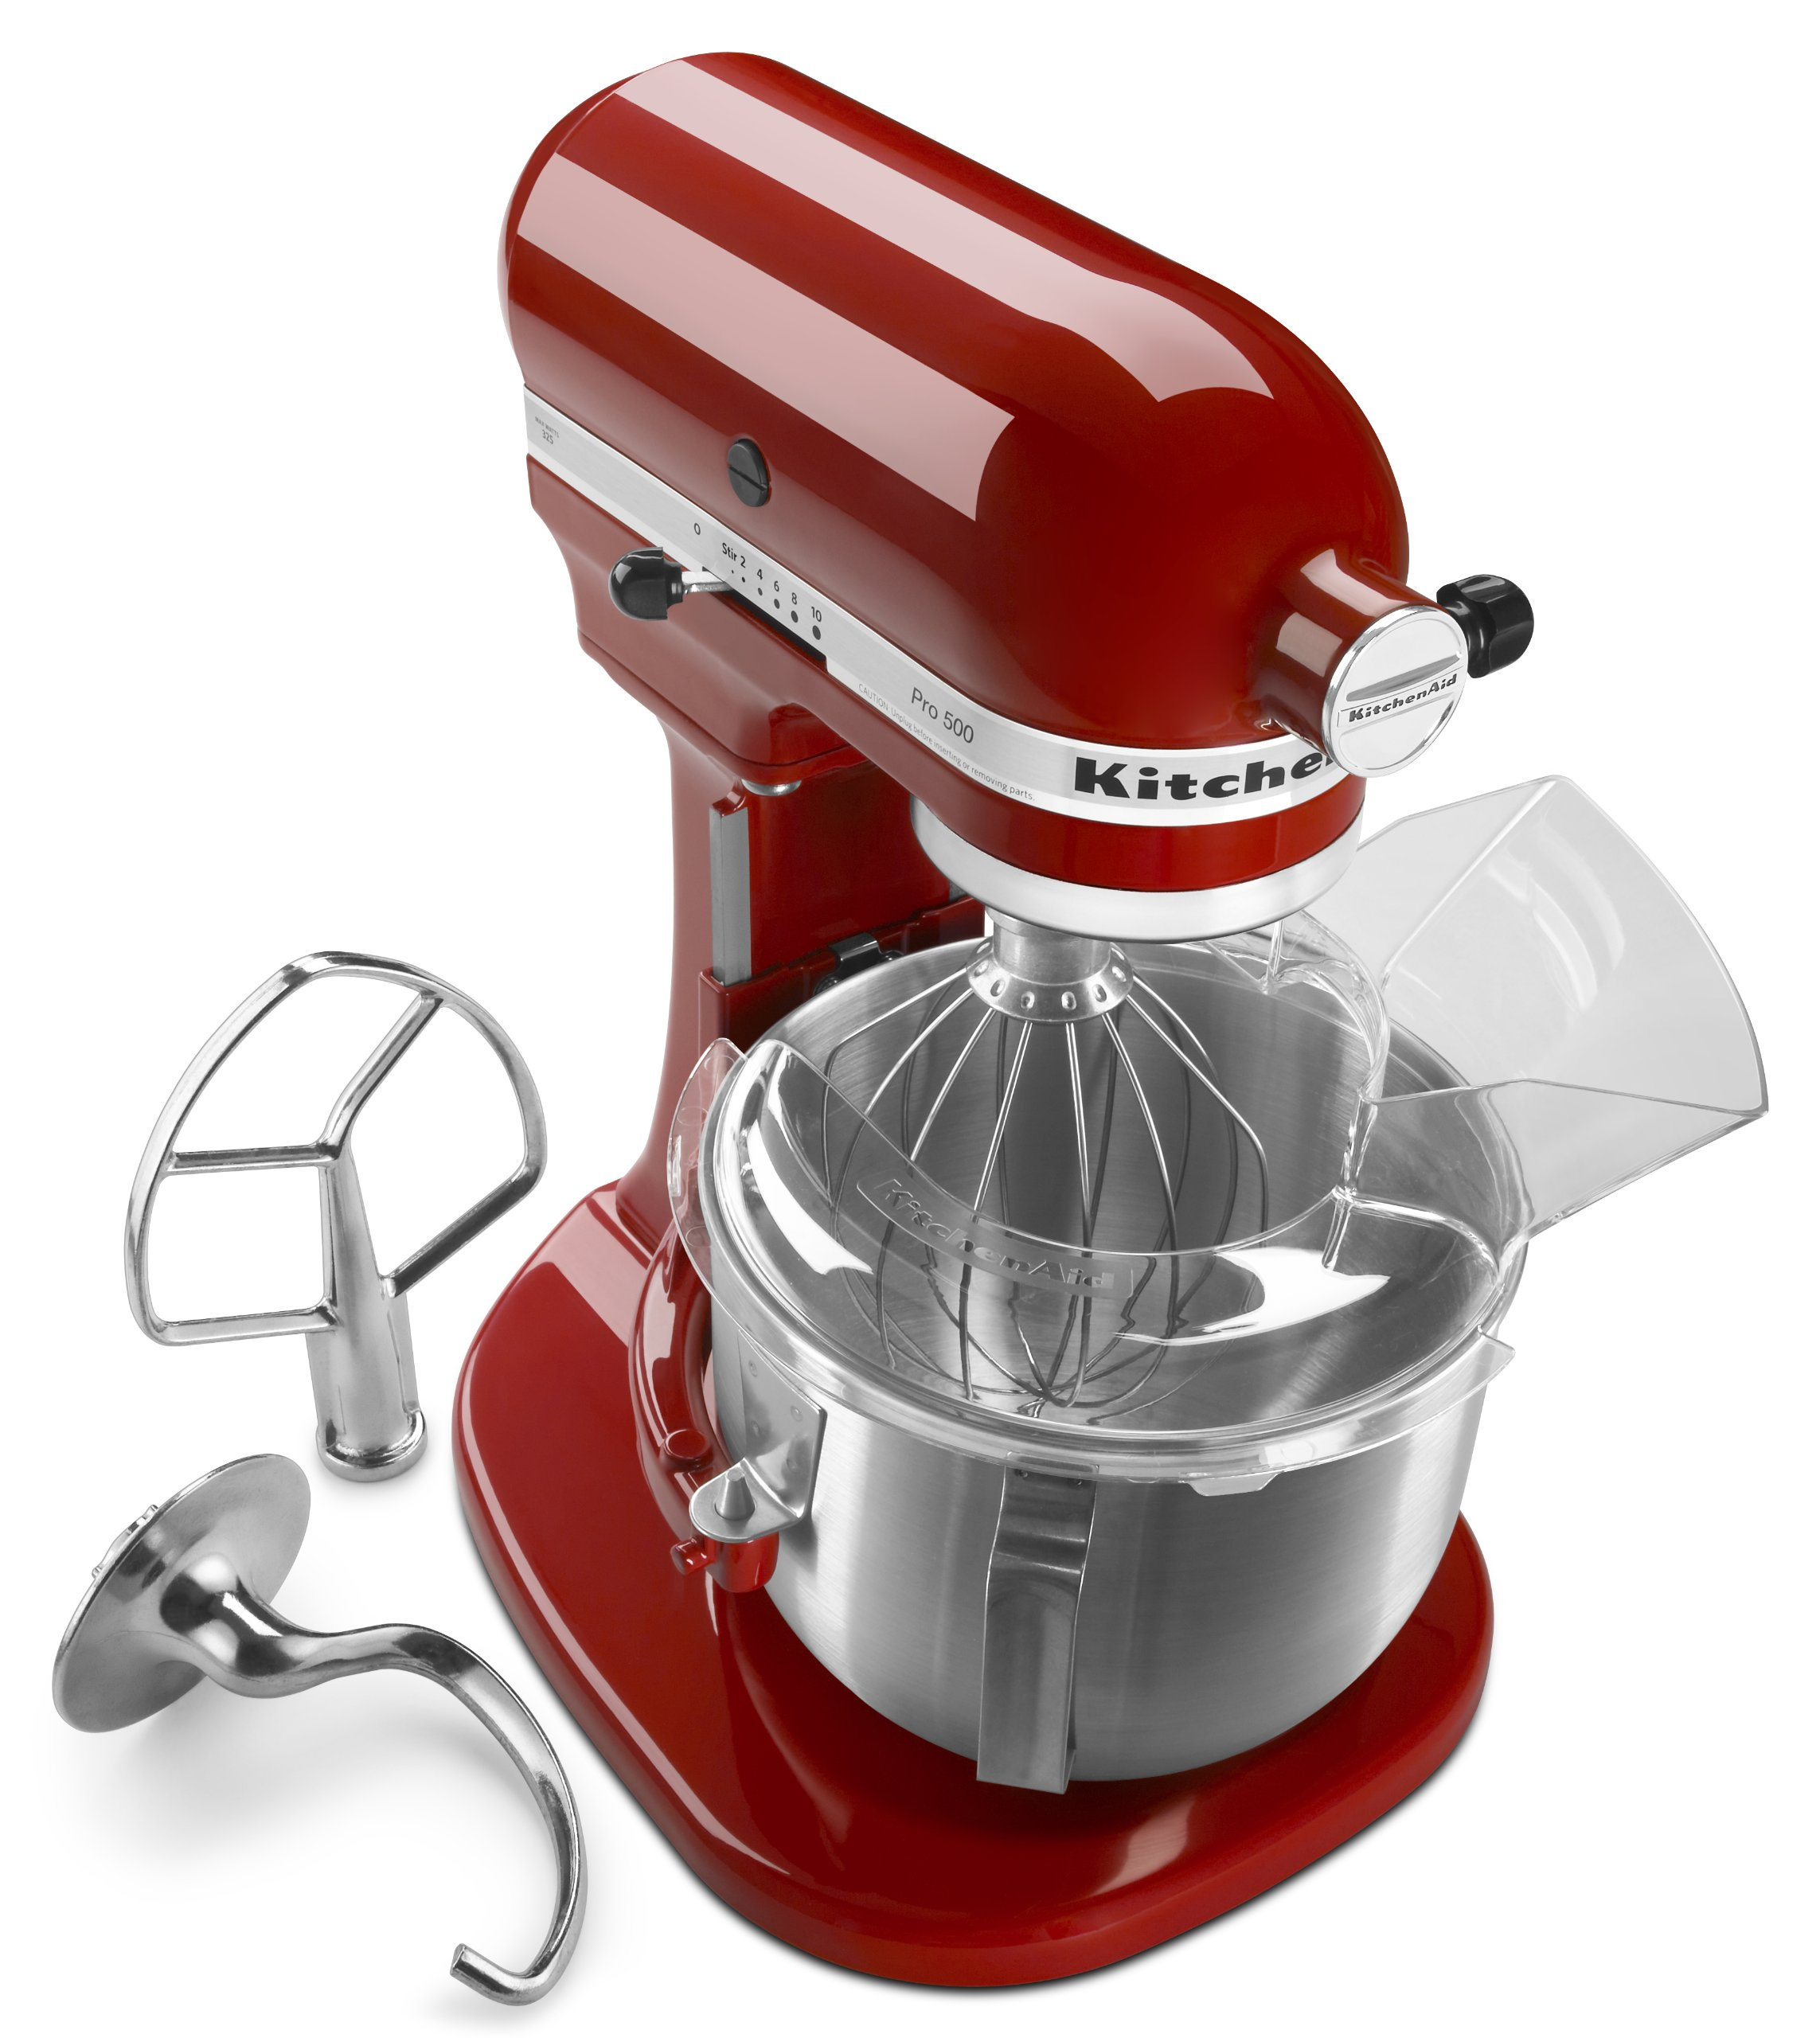 KitchenAid KSM500PSER Pro 500 Series 10-Speed 5-Quart Stand Mixer, Empire Red by KitchenAid